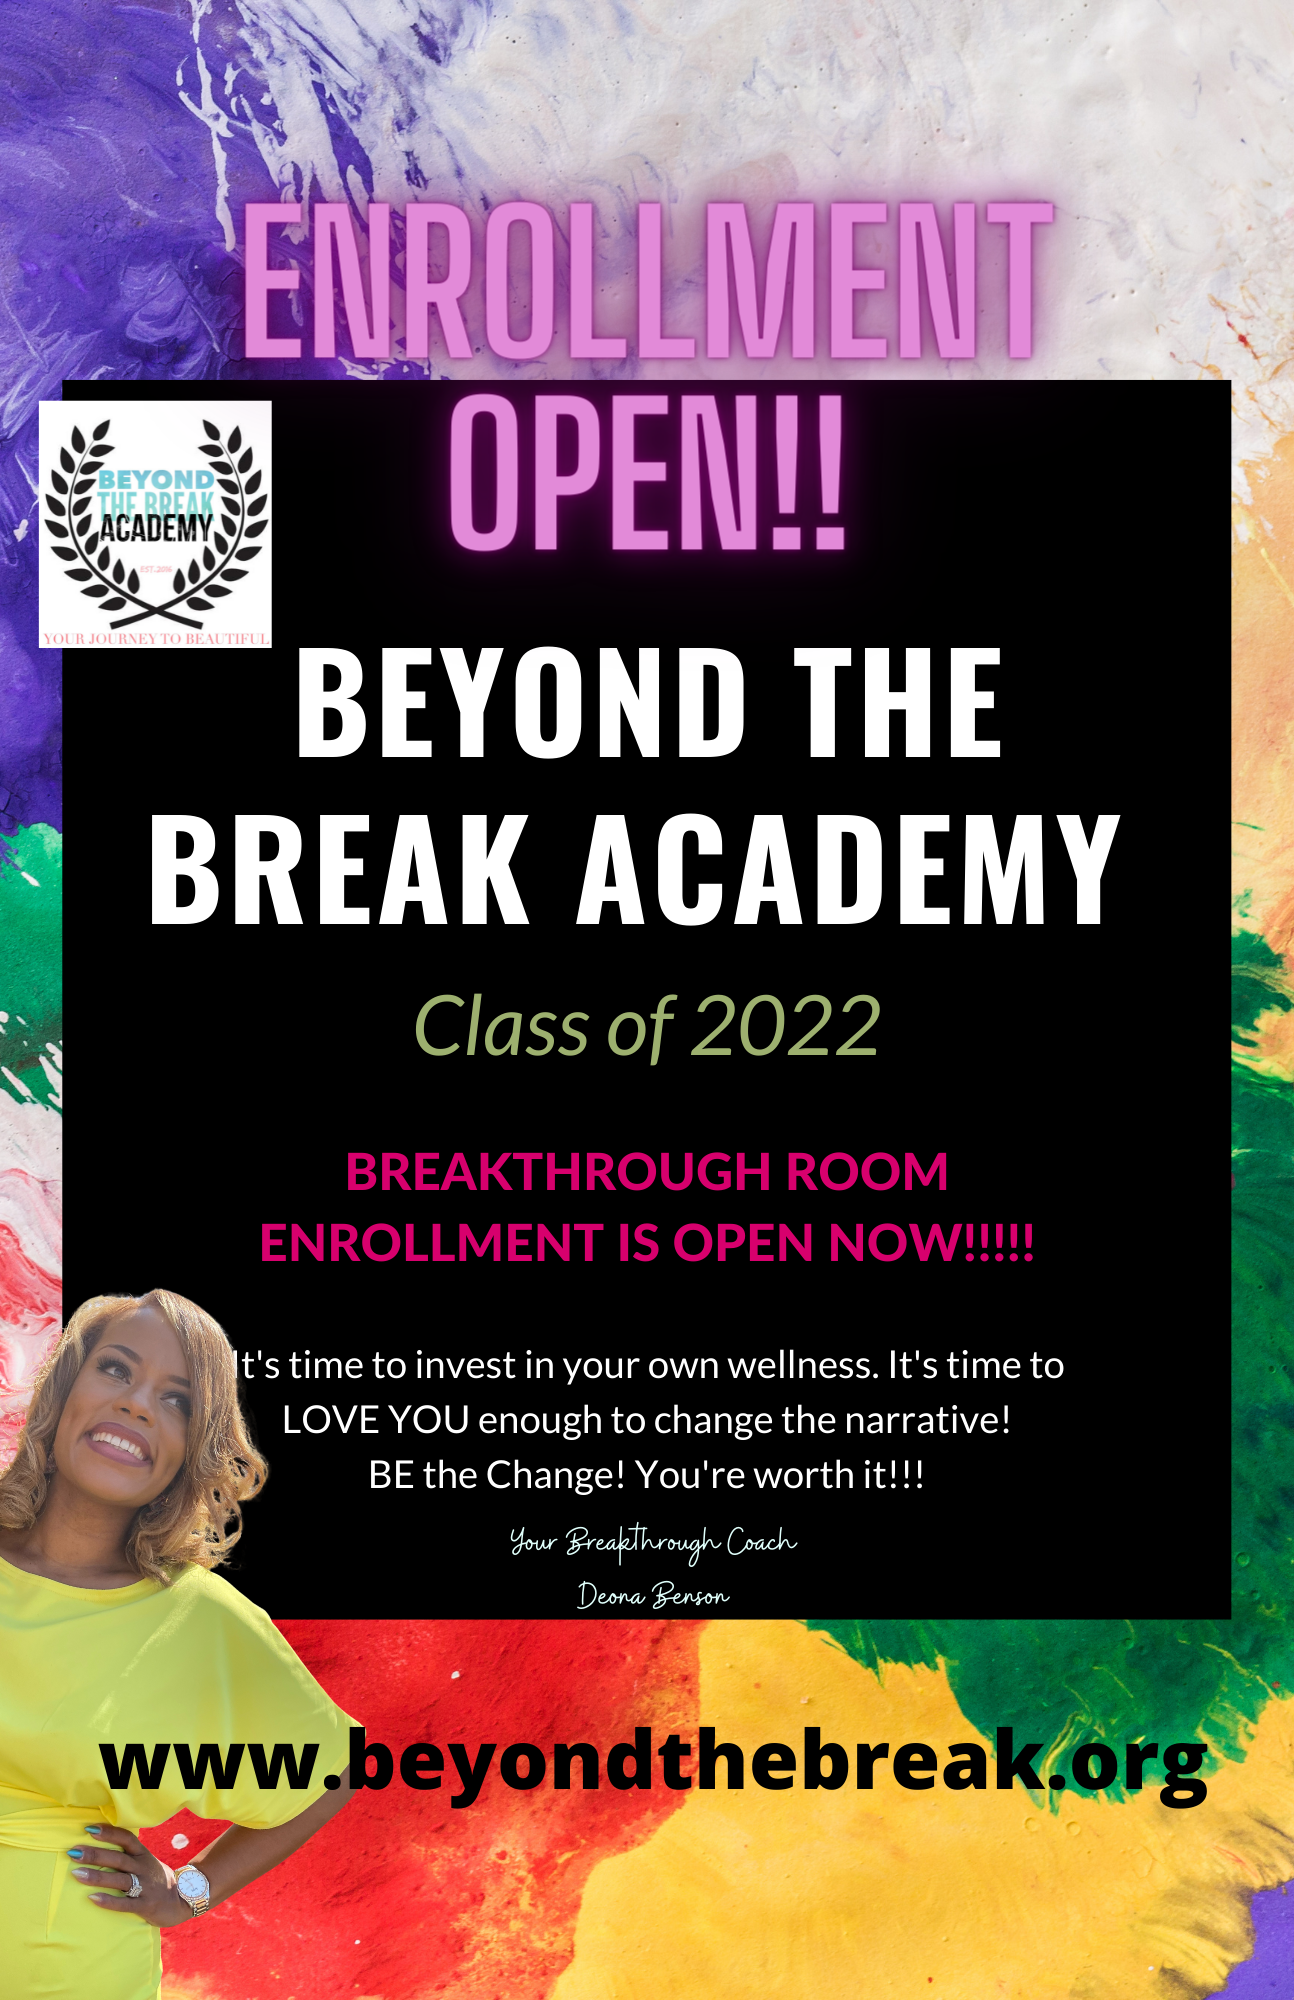 Breakthrough Room